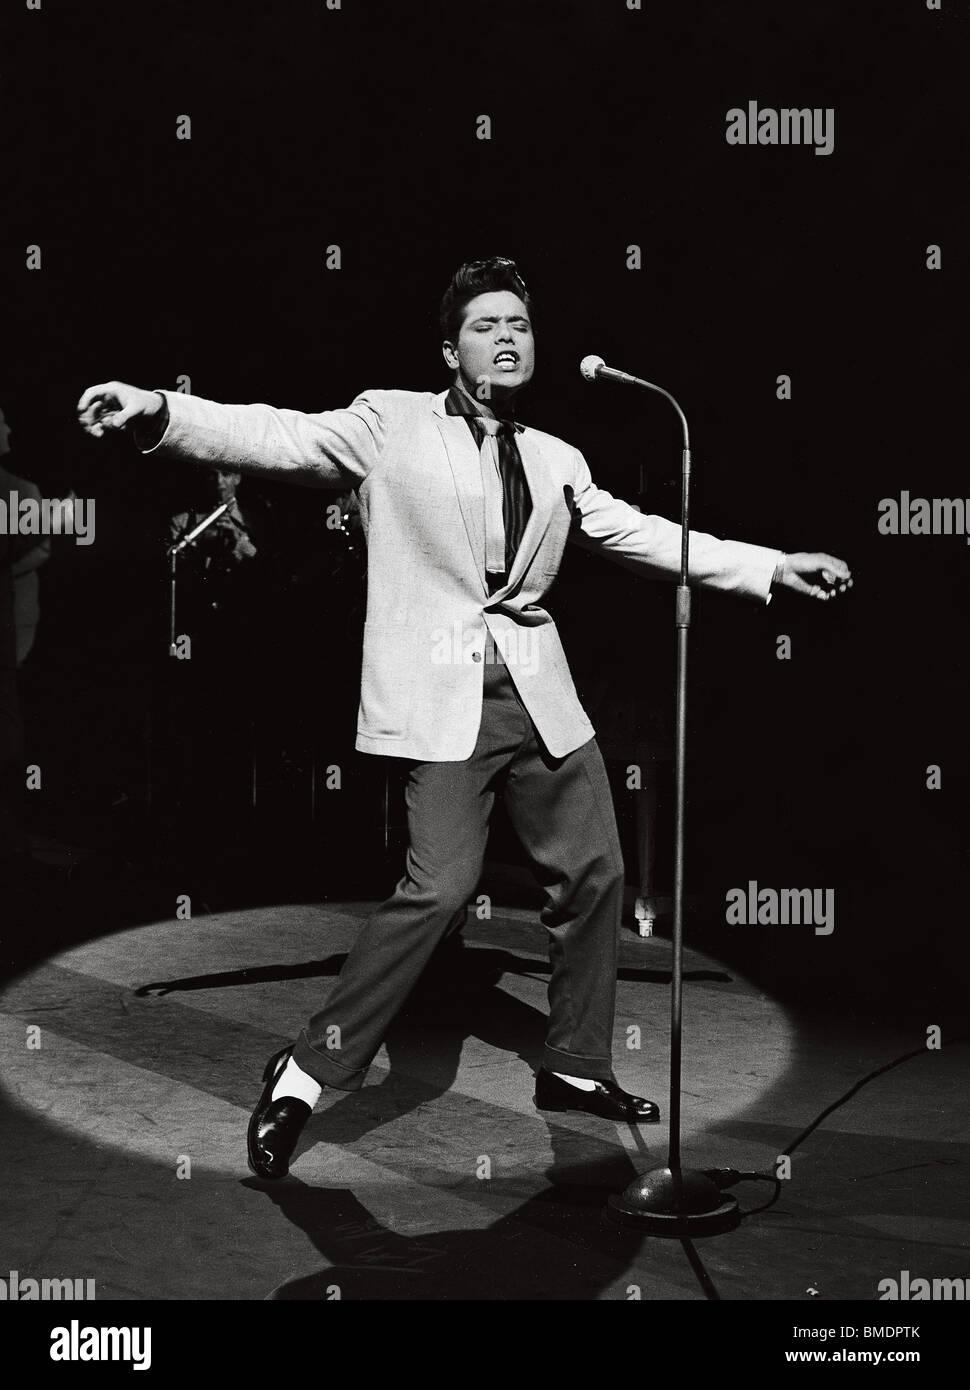 Cliff Richard, photo Harry Hammond. England, 1958 - Stock Image